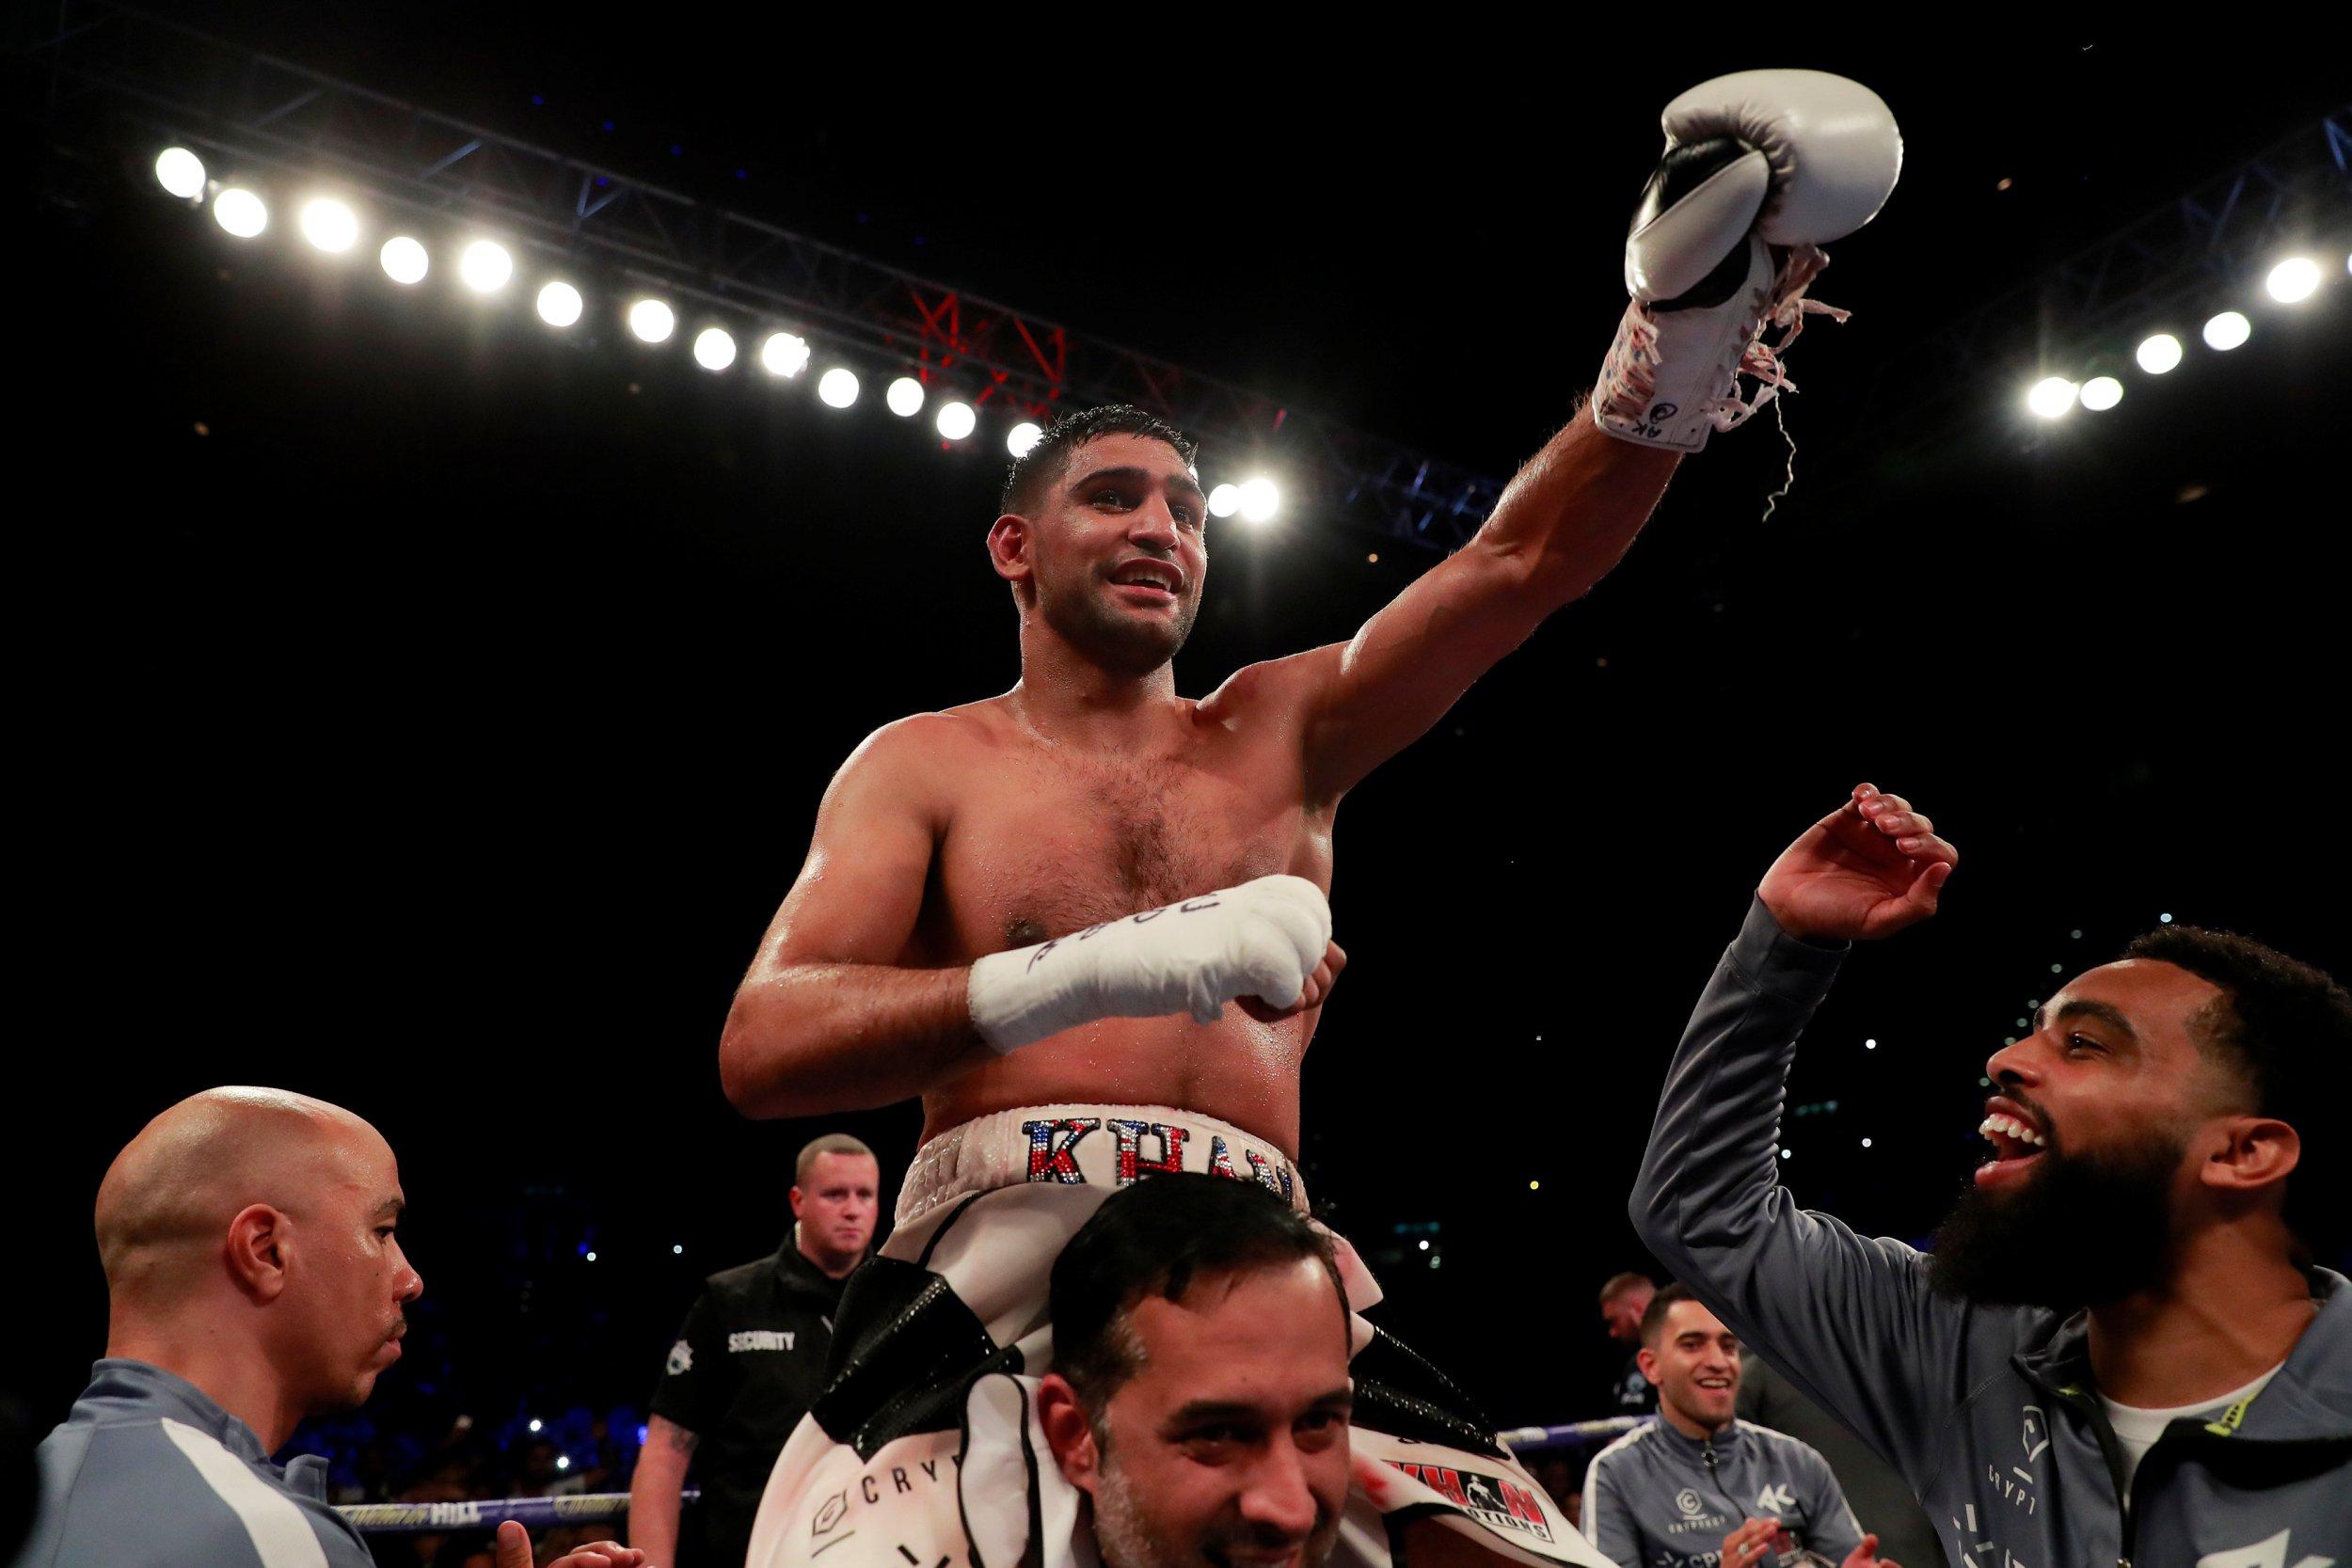 Boxing - Amir Khan v Samuel Vargas - Arena Birmingham, Birmingham, Britain - September 8, 2018 Amir Khan celebrates winning the fight Action Images via Reuters/Andrew Couldridge